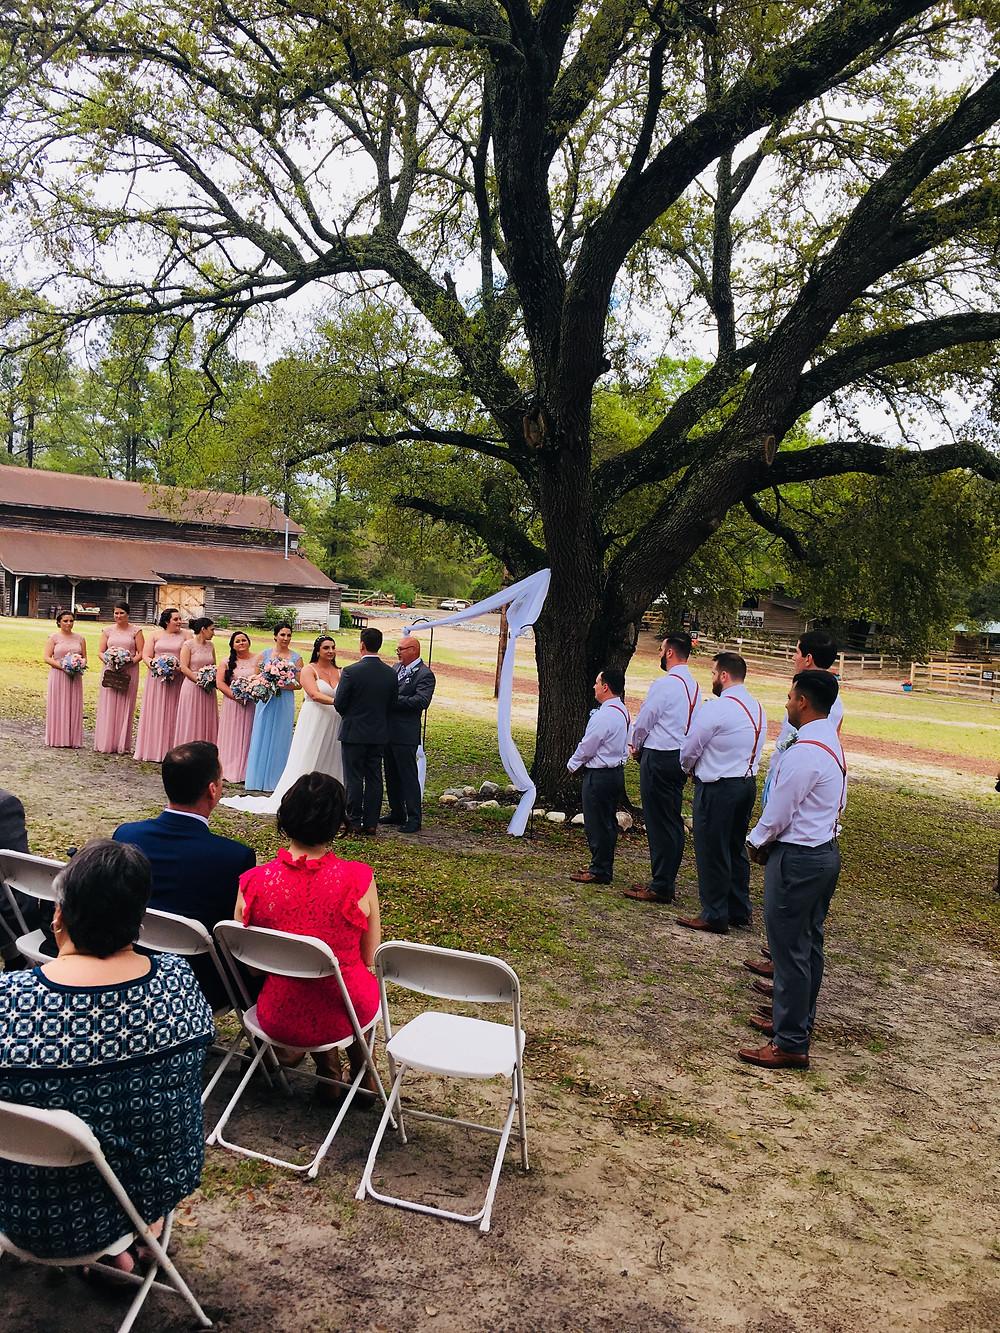 Wedding Ceremony, Bride and Groom Saying Wedding Vows